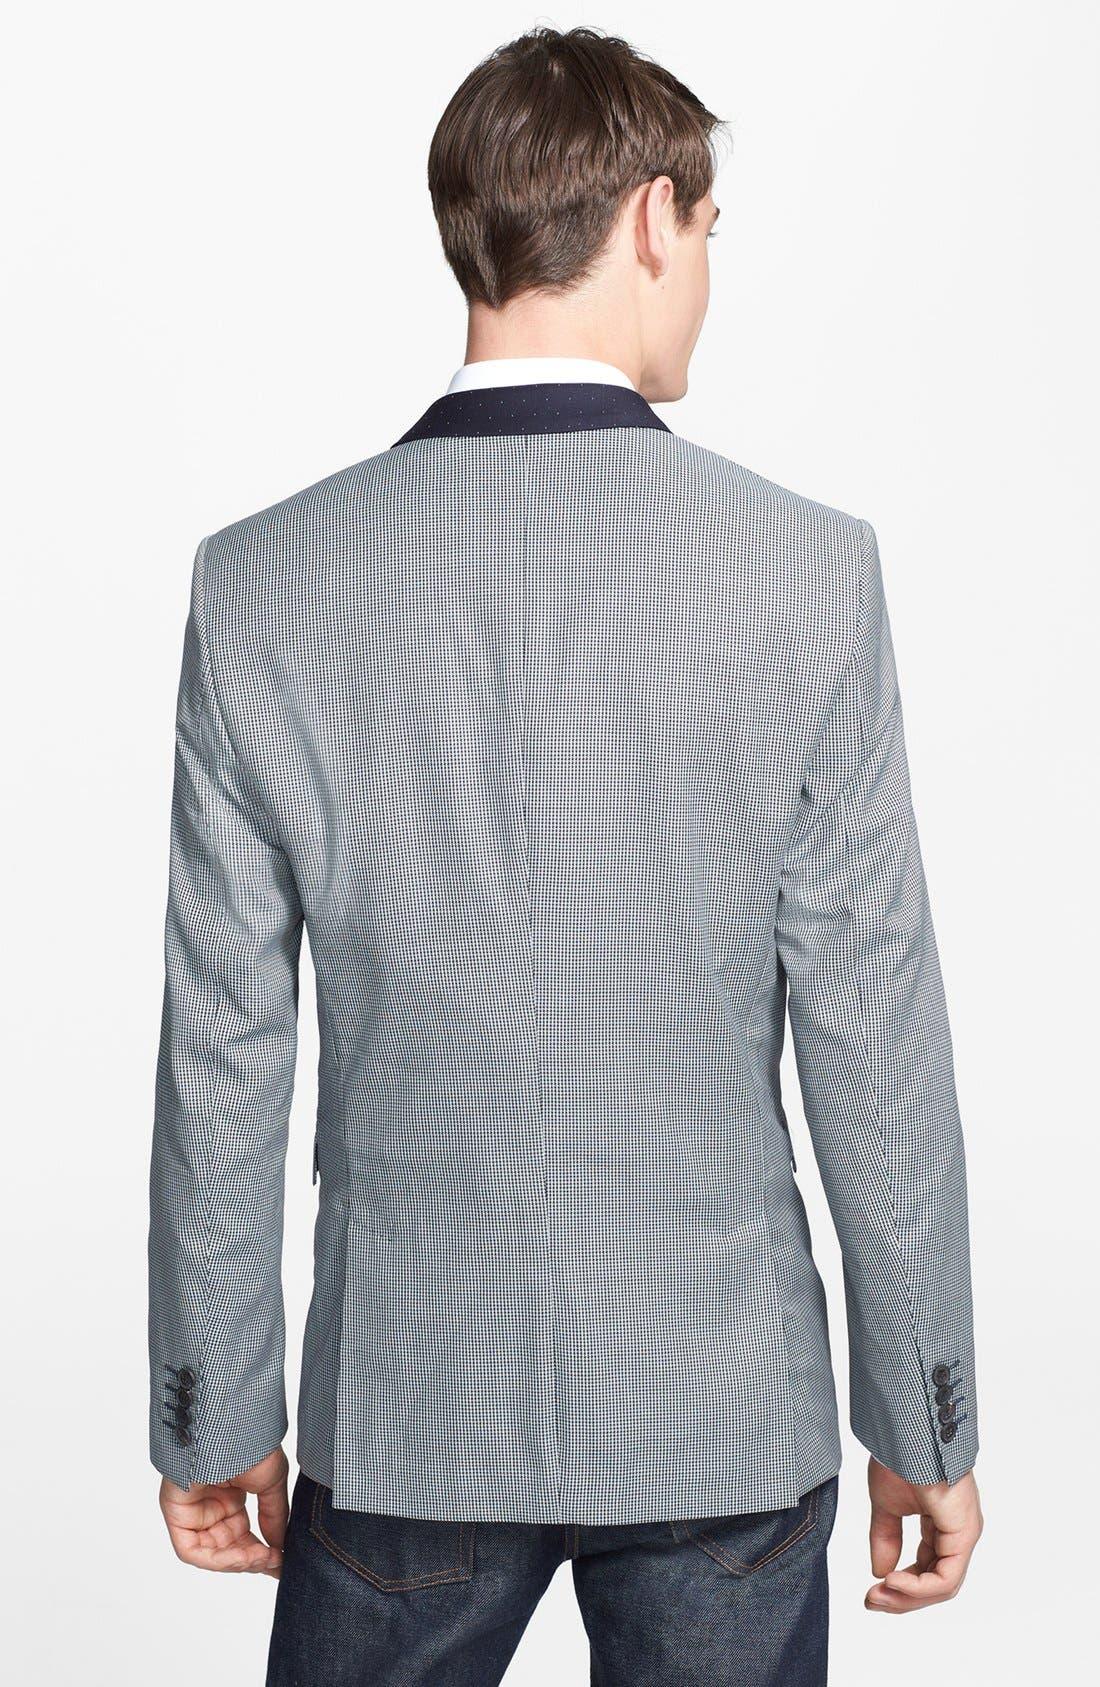 Alternate Image 2  - Paul Smith London 'Byard' Contrast Houndstooth Wool Sportcoat